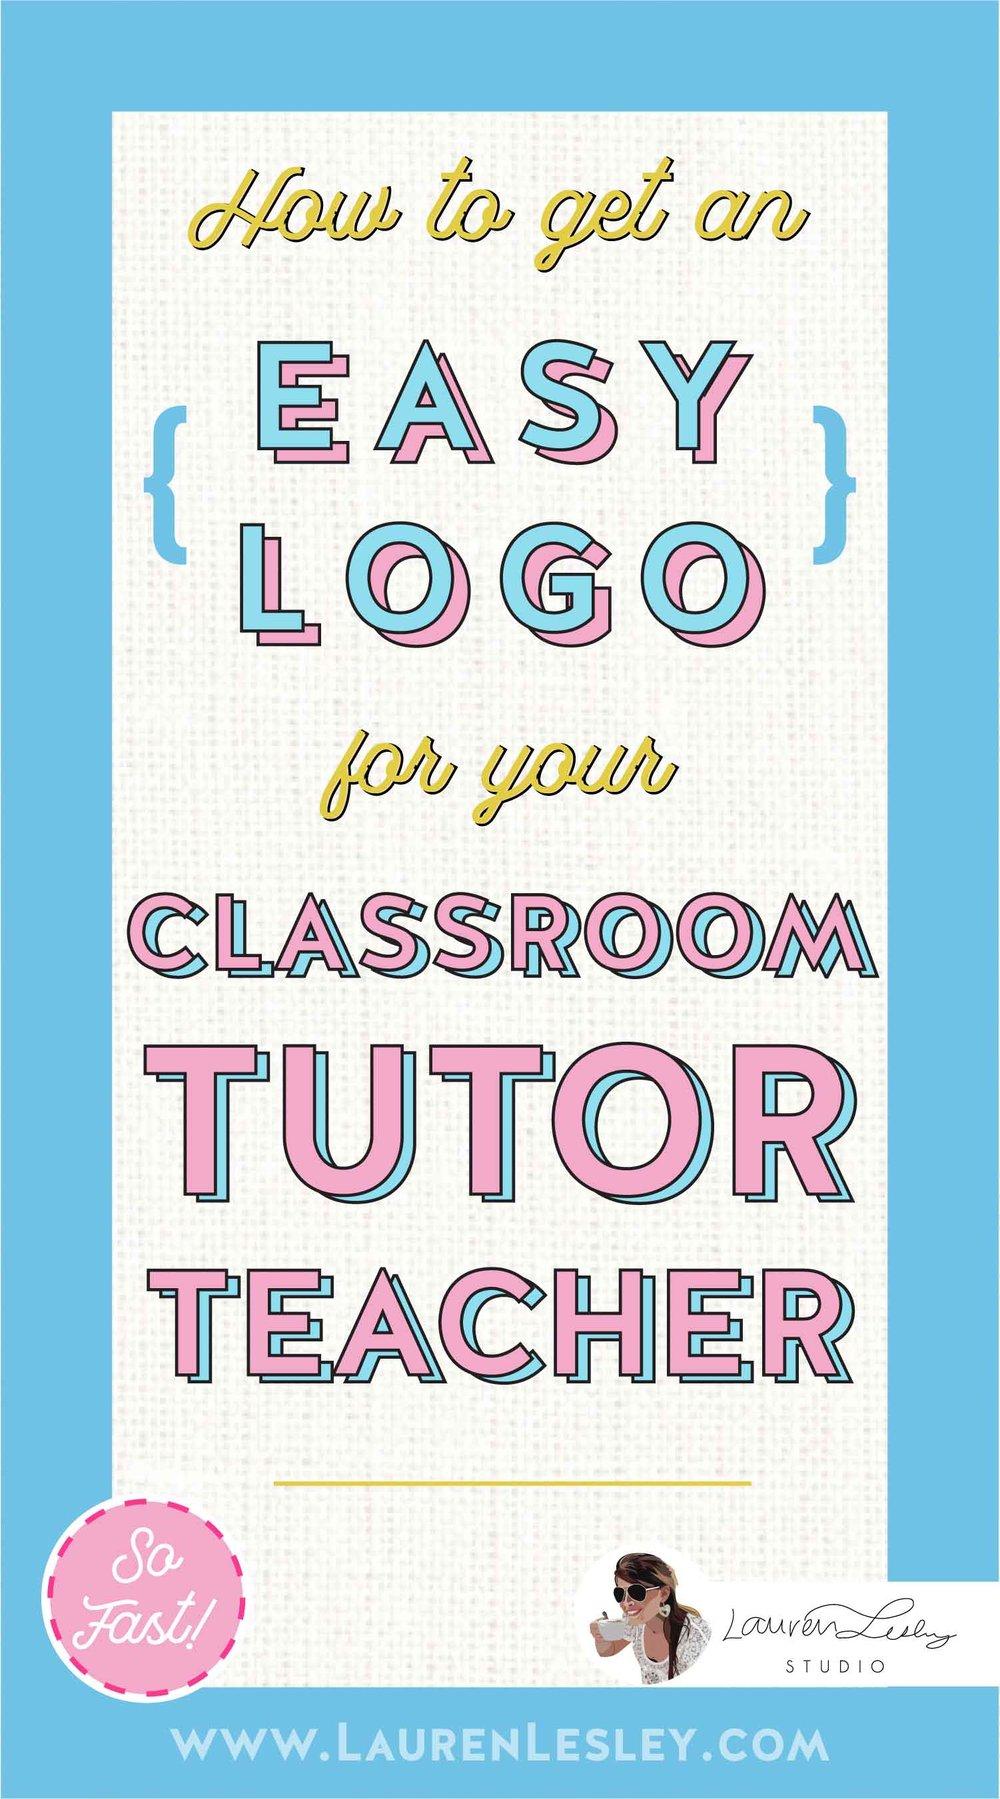 Teacher Tutor Classroom Clip Art